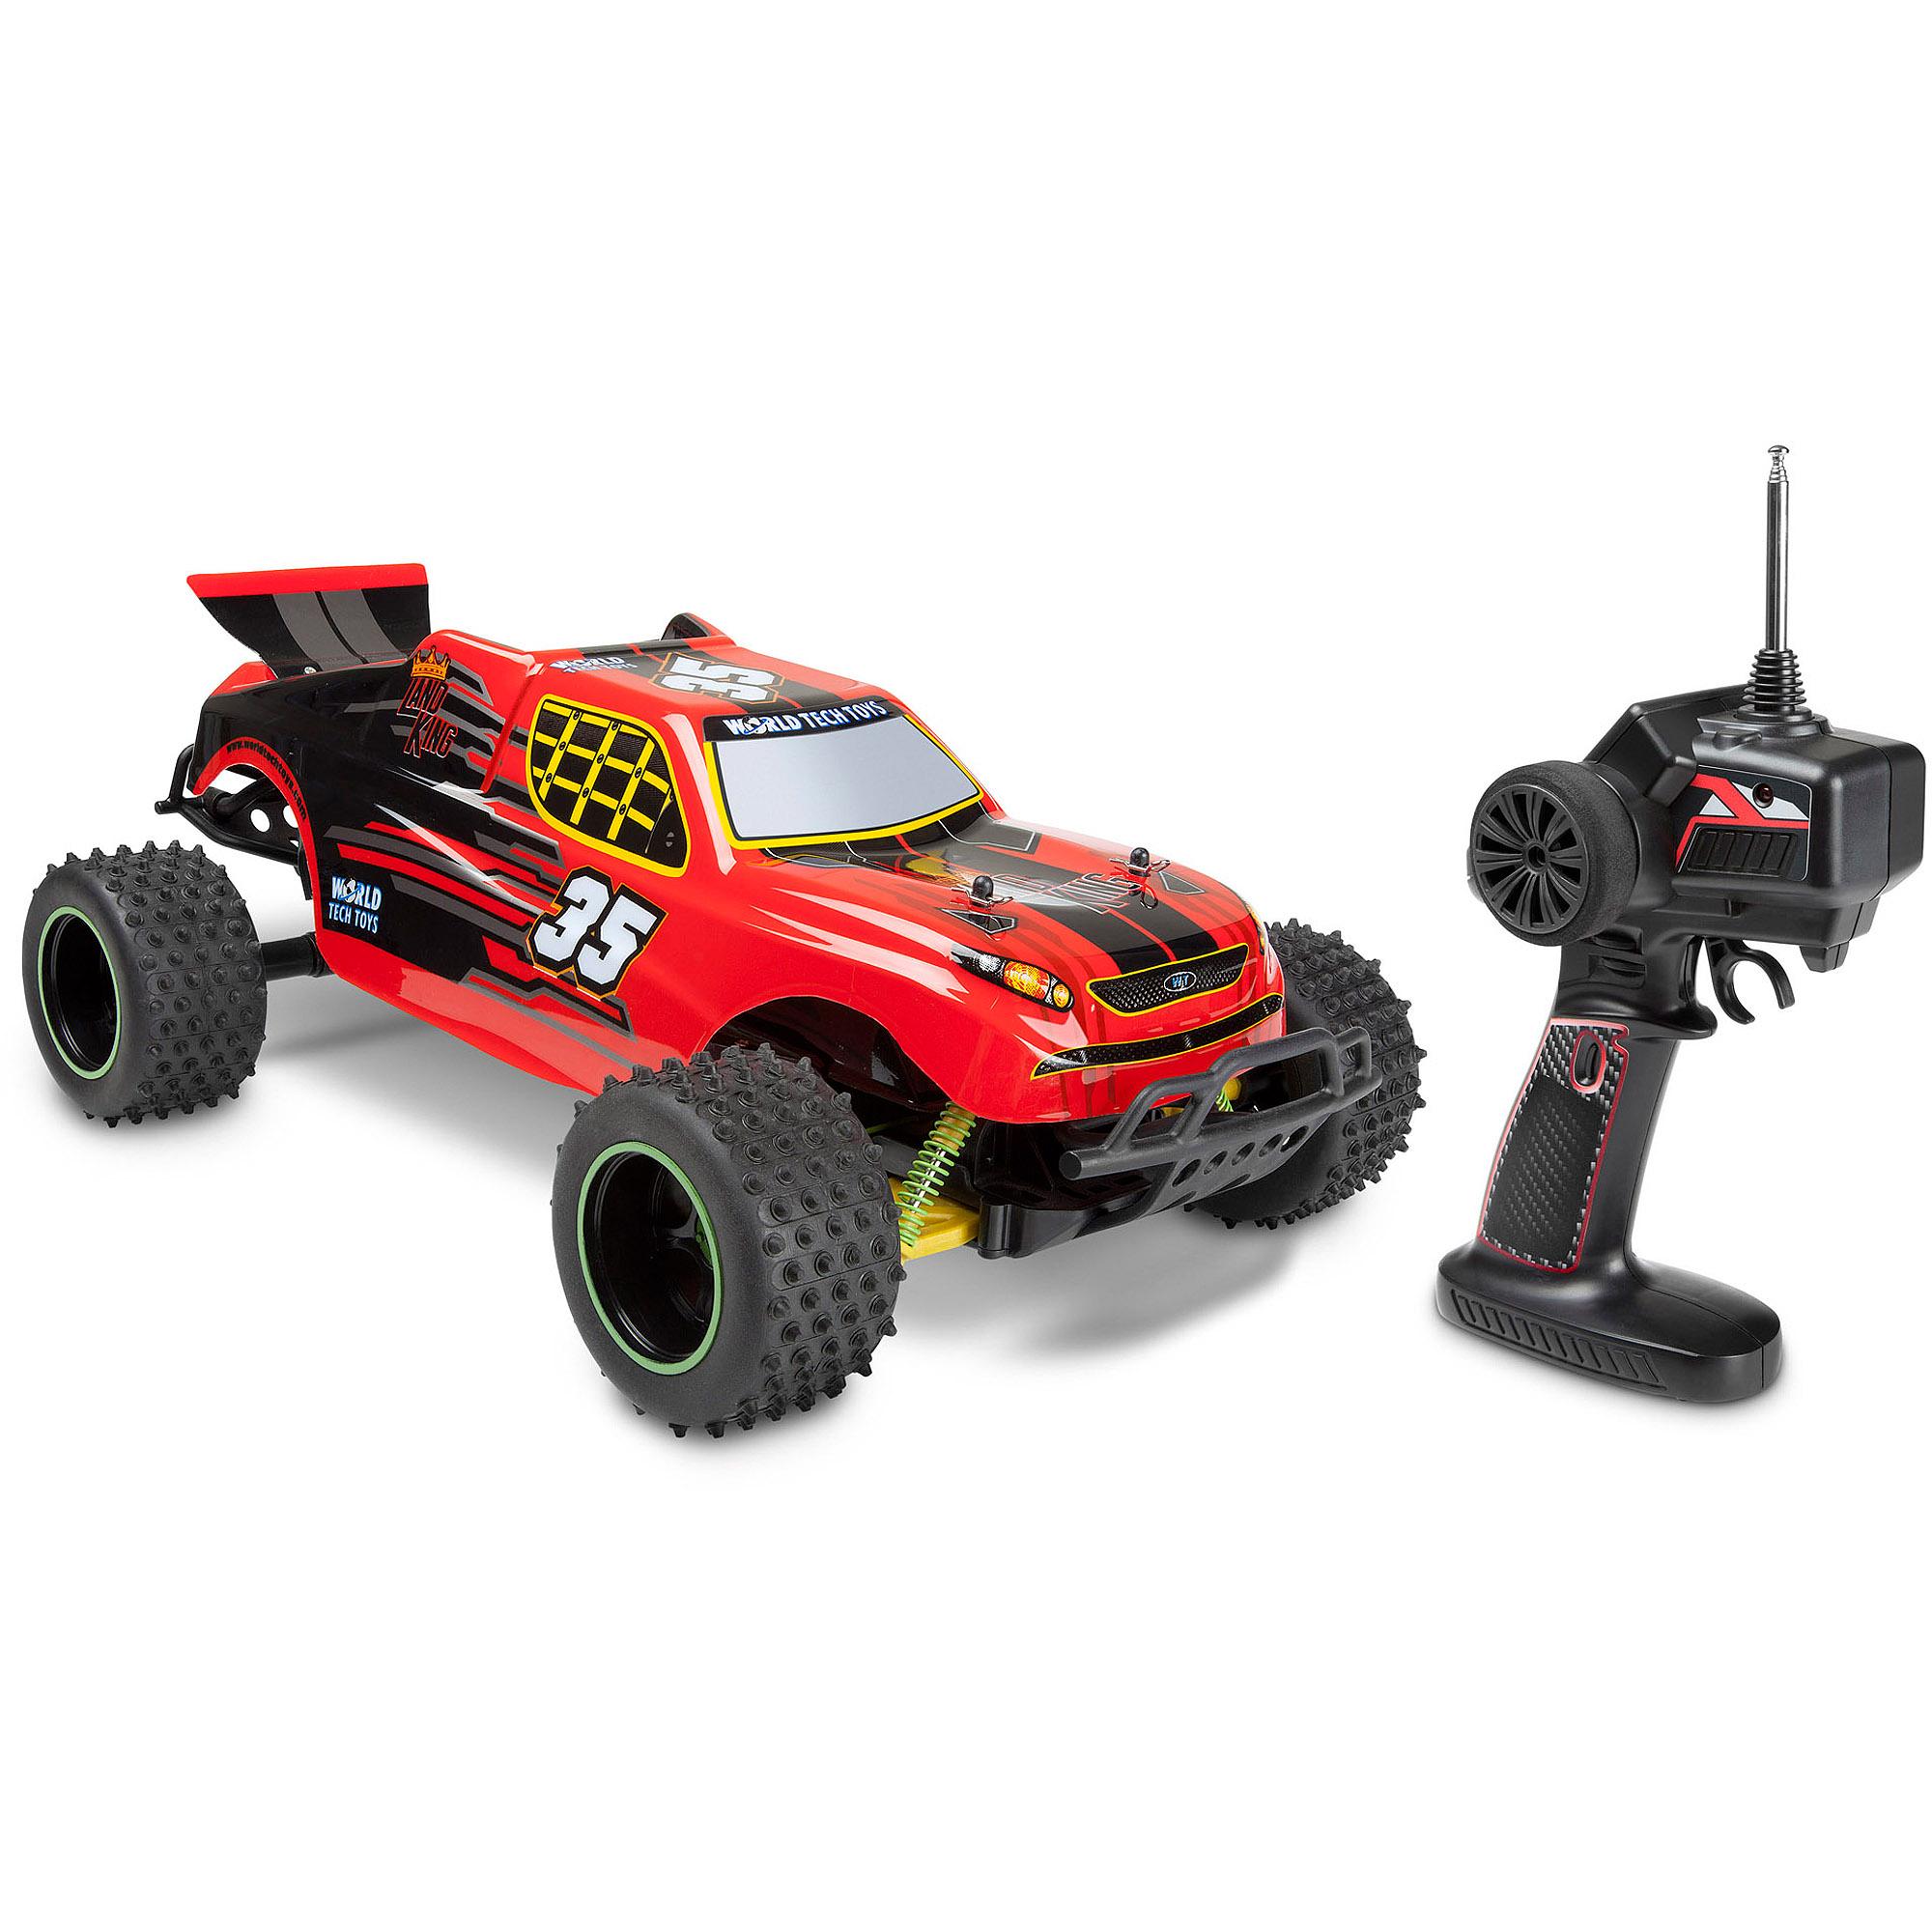 World Tech Toys 1:12 Land King RC Truggy